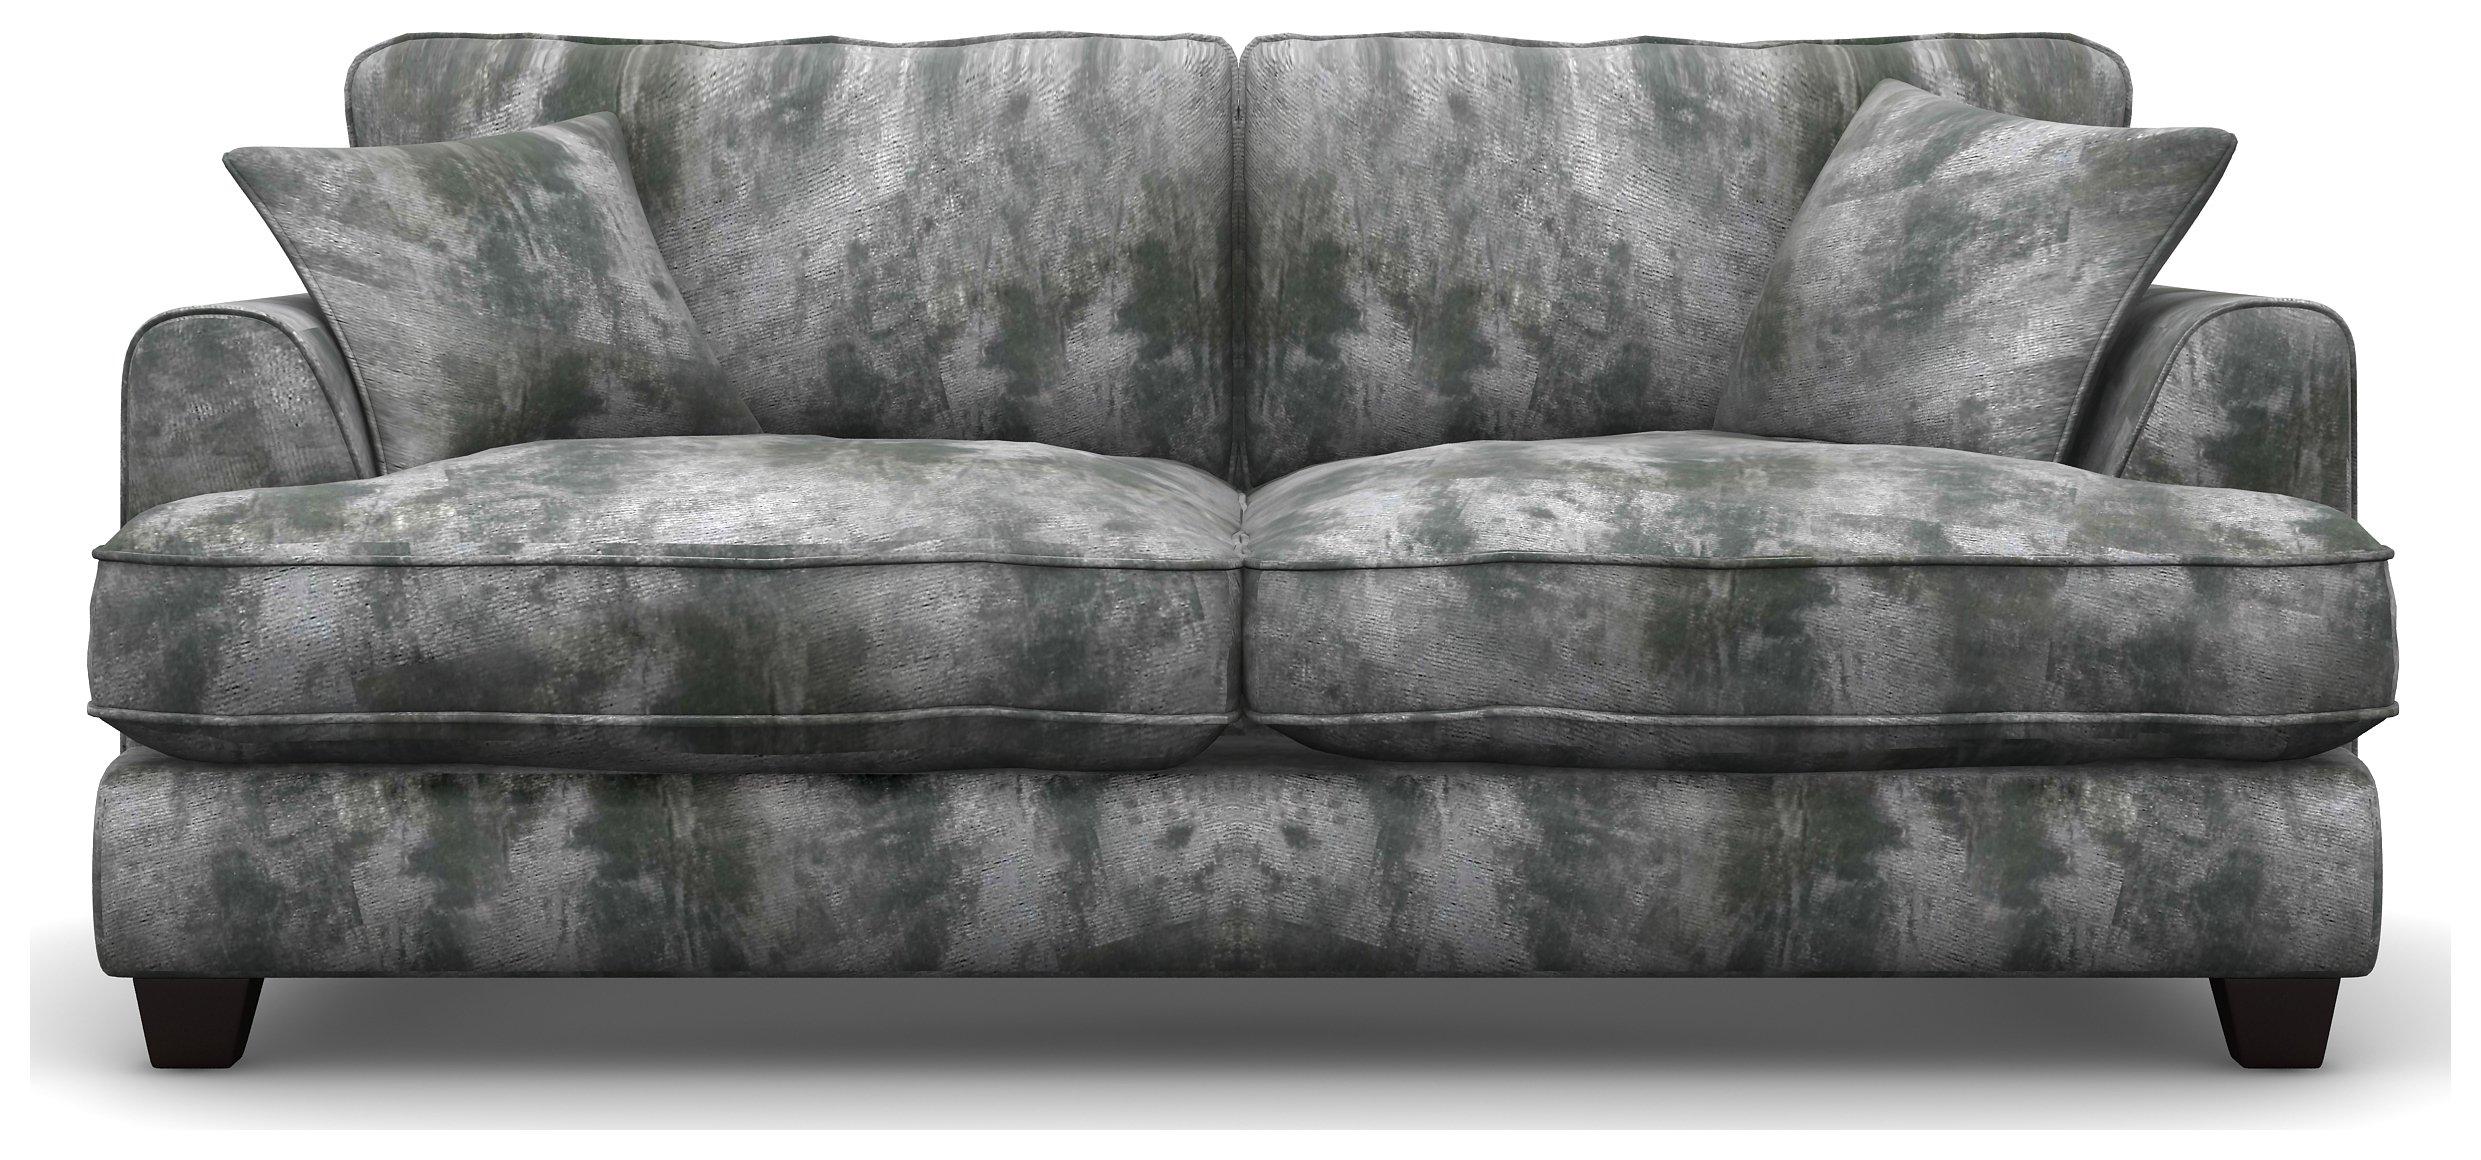 Hampstead 3 Seat Shimmer Fabric Sofa - Silver + Black Legs